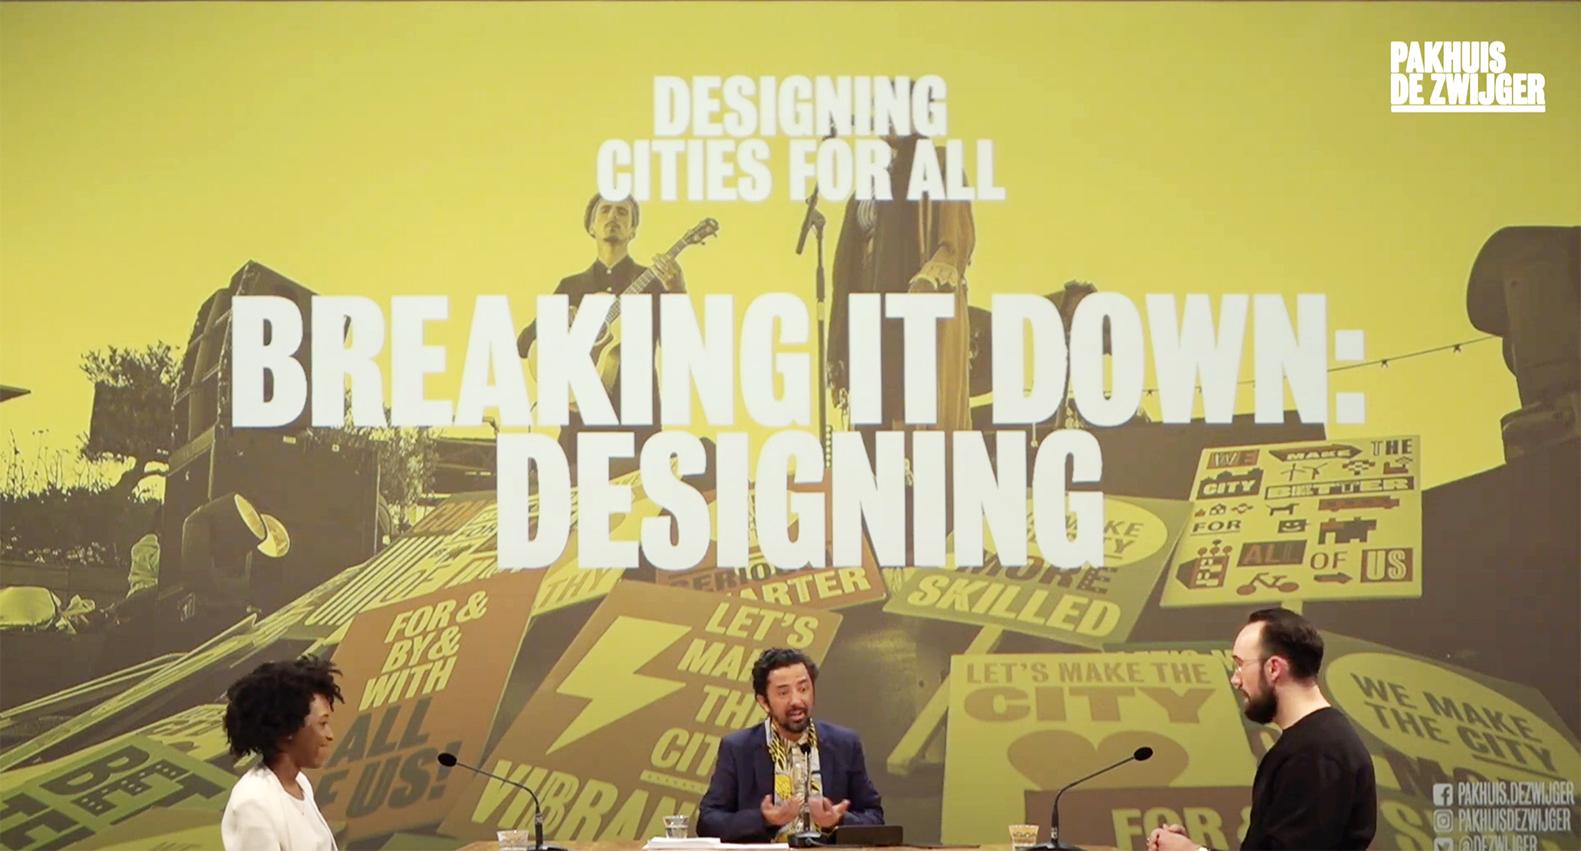 Designing Cities for All 2 Breaking it down: Designing - Pakhuis de Zwijger - Nyasha Harper-Michon